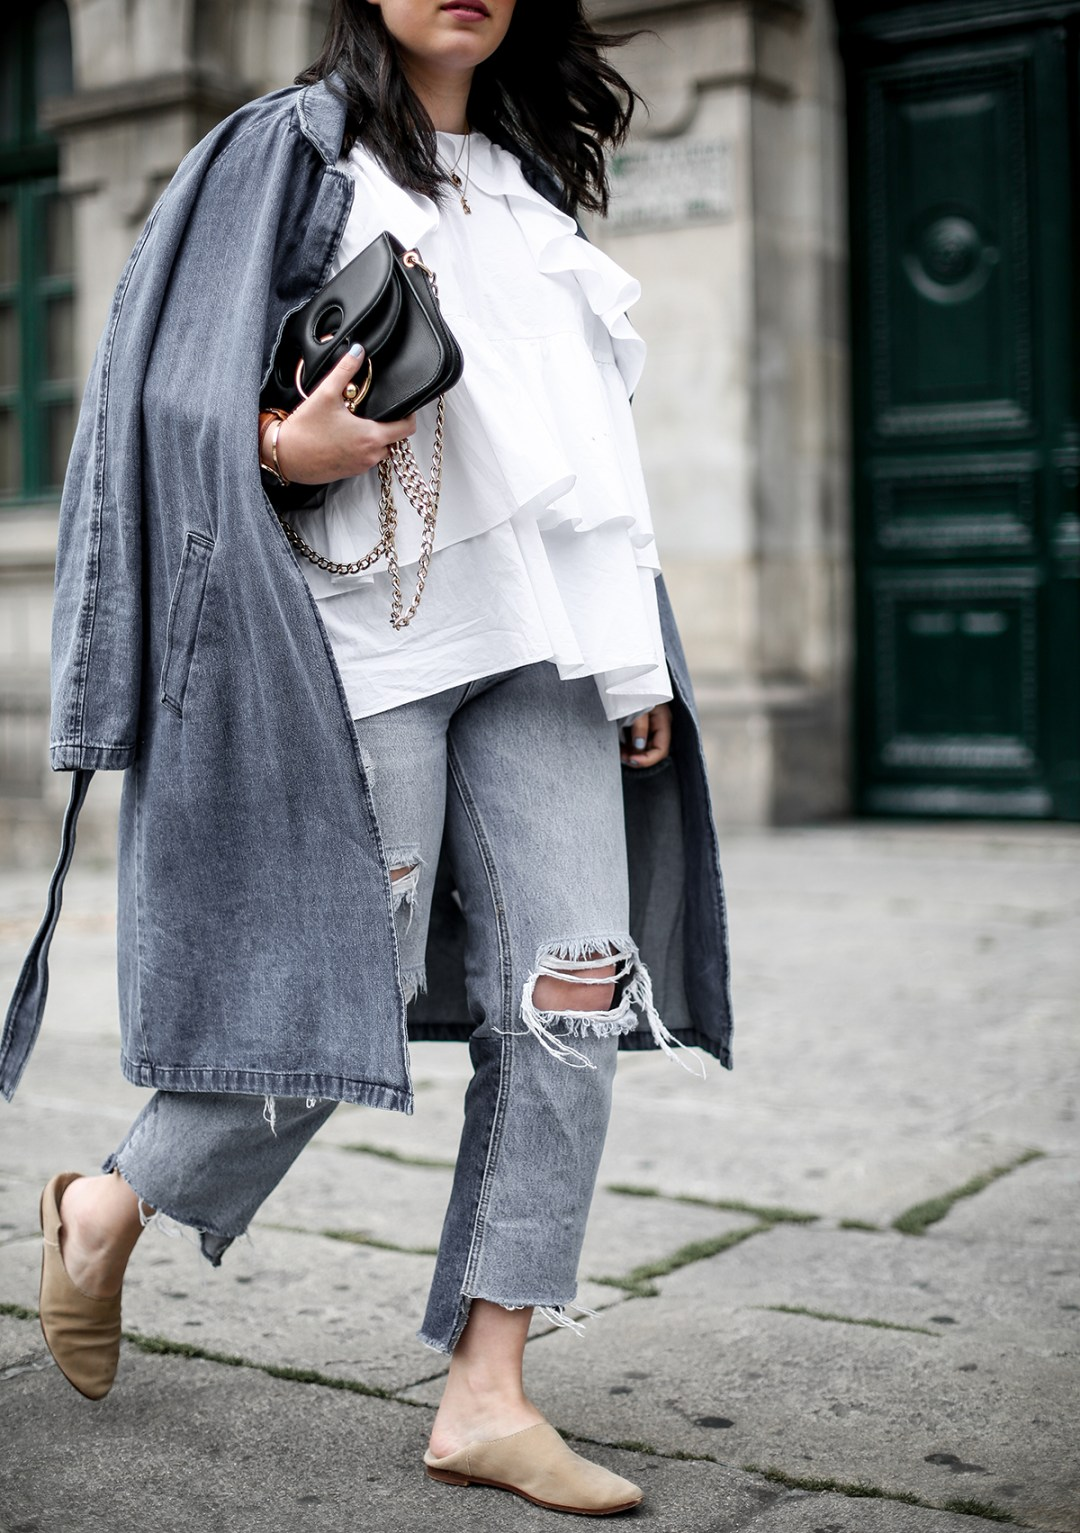 trench-denim-ripped-jeans-ruffle-blouse-zara-streetstyle6